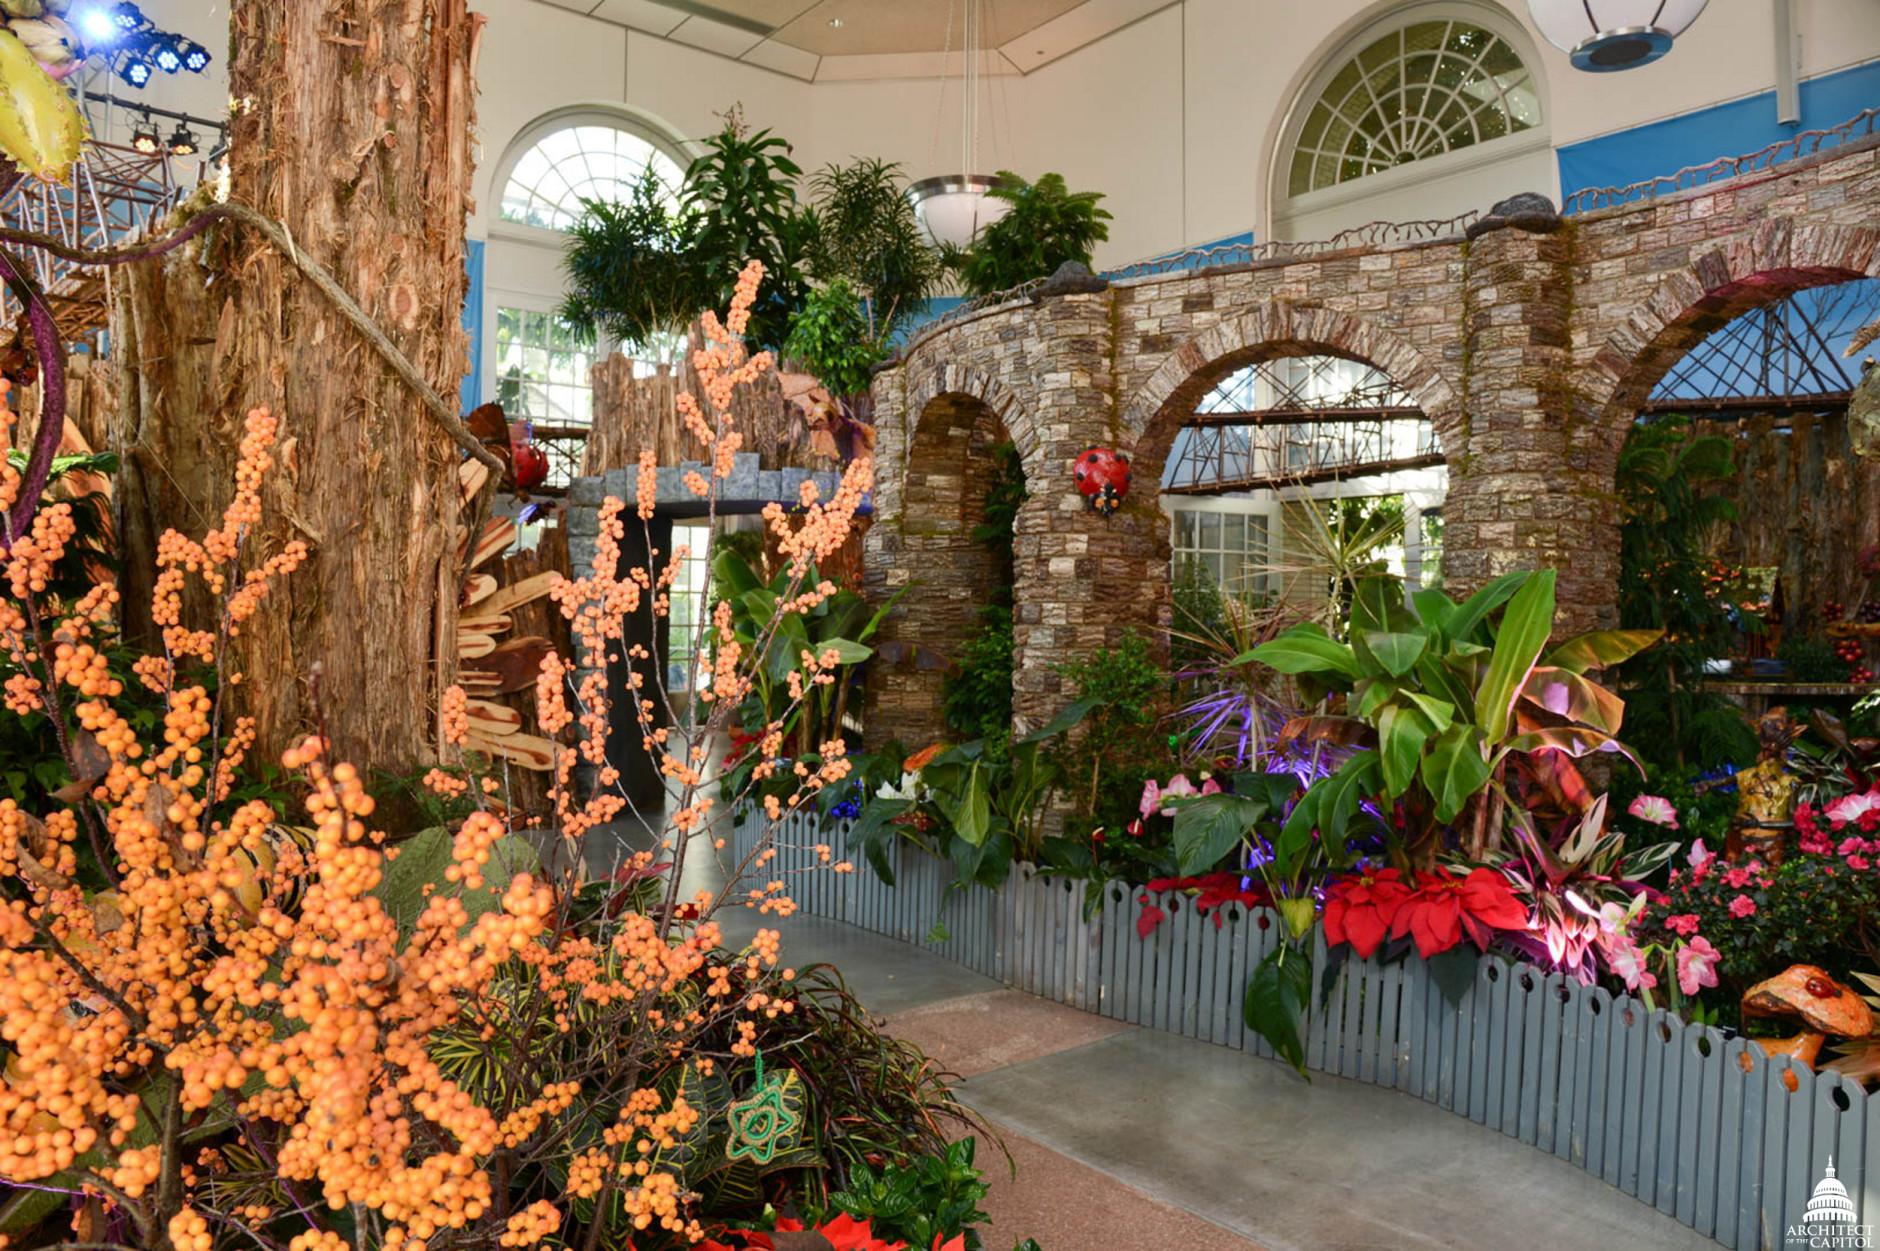 Botanic Garden recreates D.C. landmarks in holiday exhibit